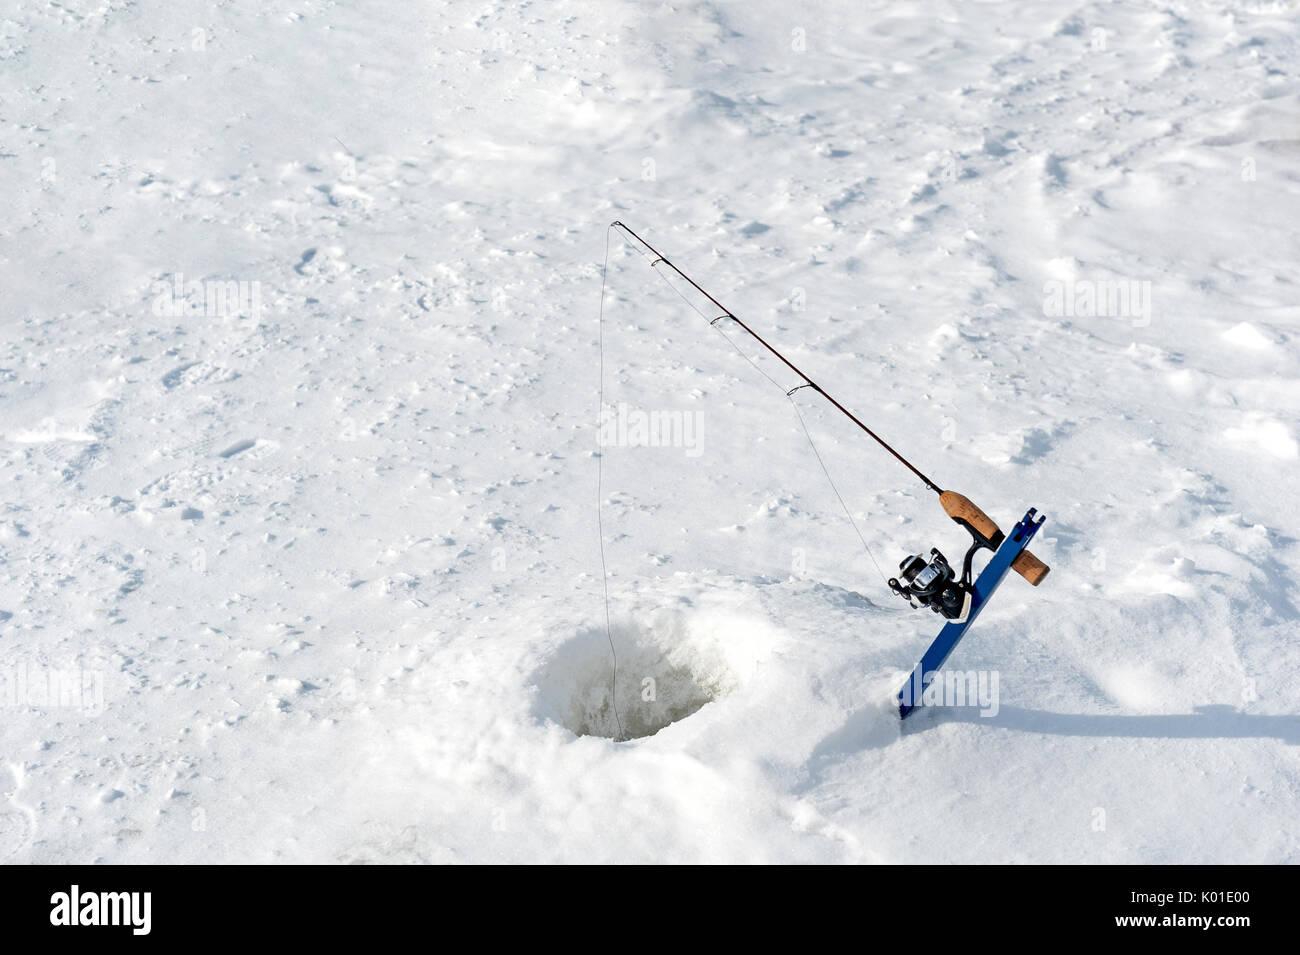 Ice fishing canada stock photos ice fishing canada stock for Ice fishing hole